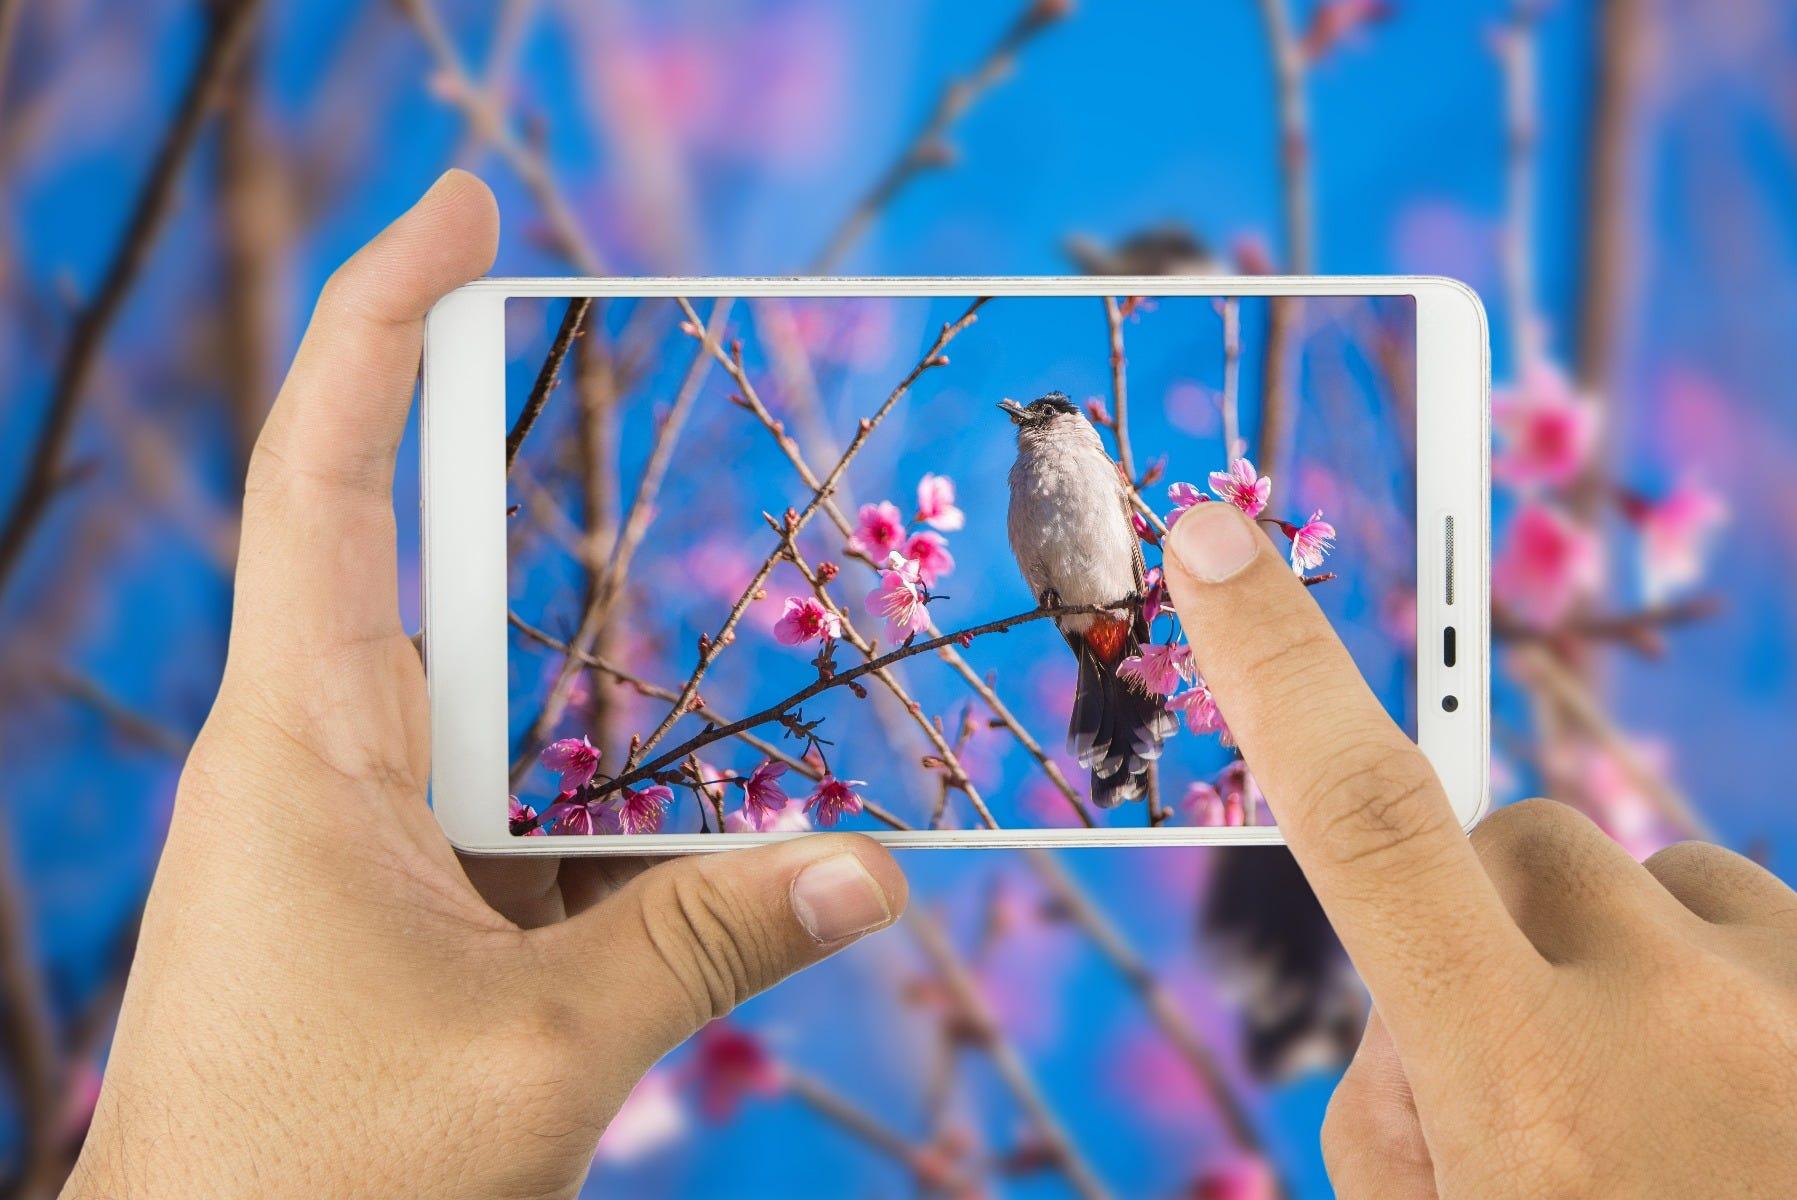 smartphone lense